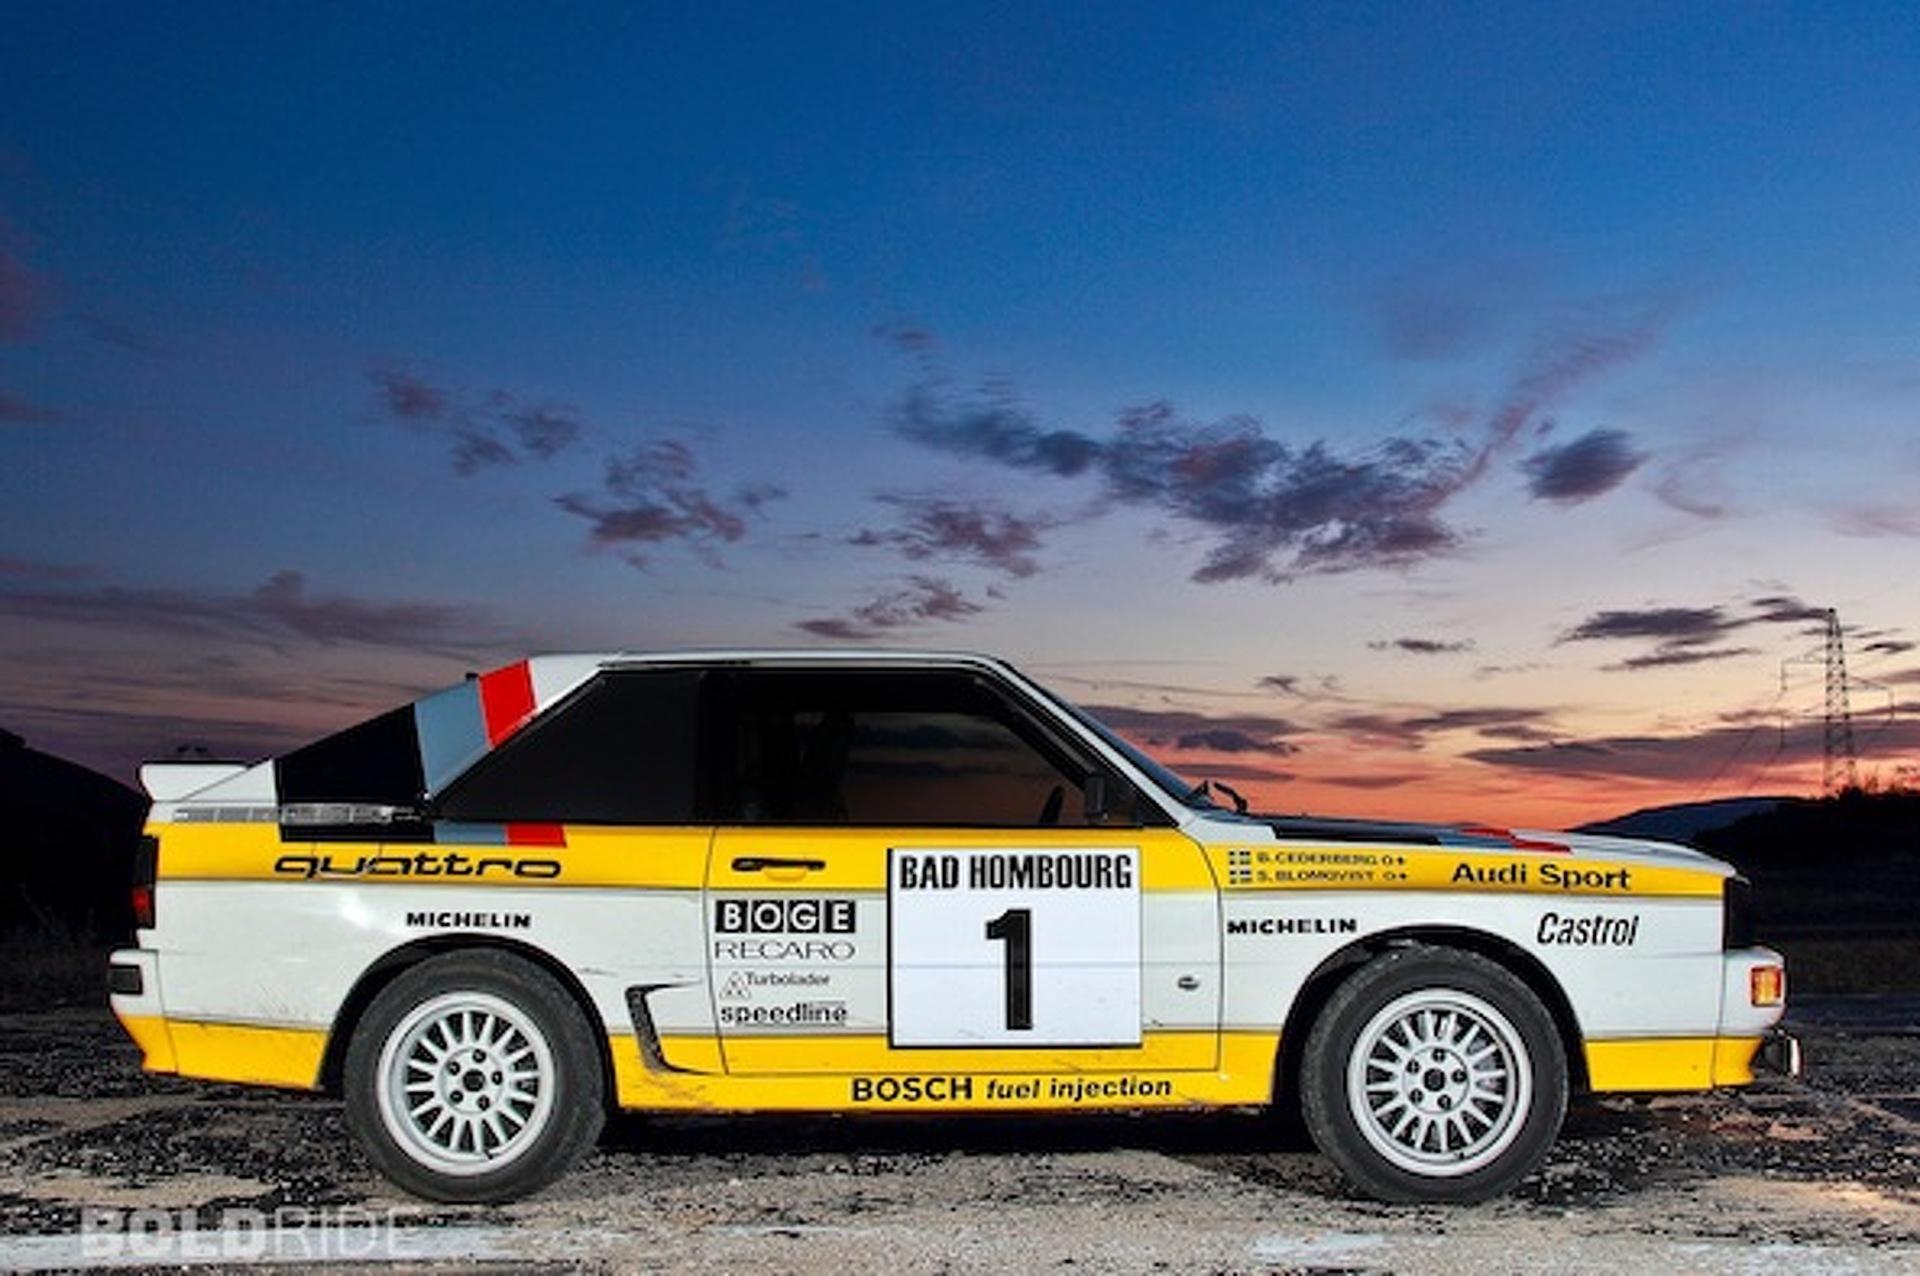 1985 Audi Quattro Rally Car